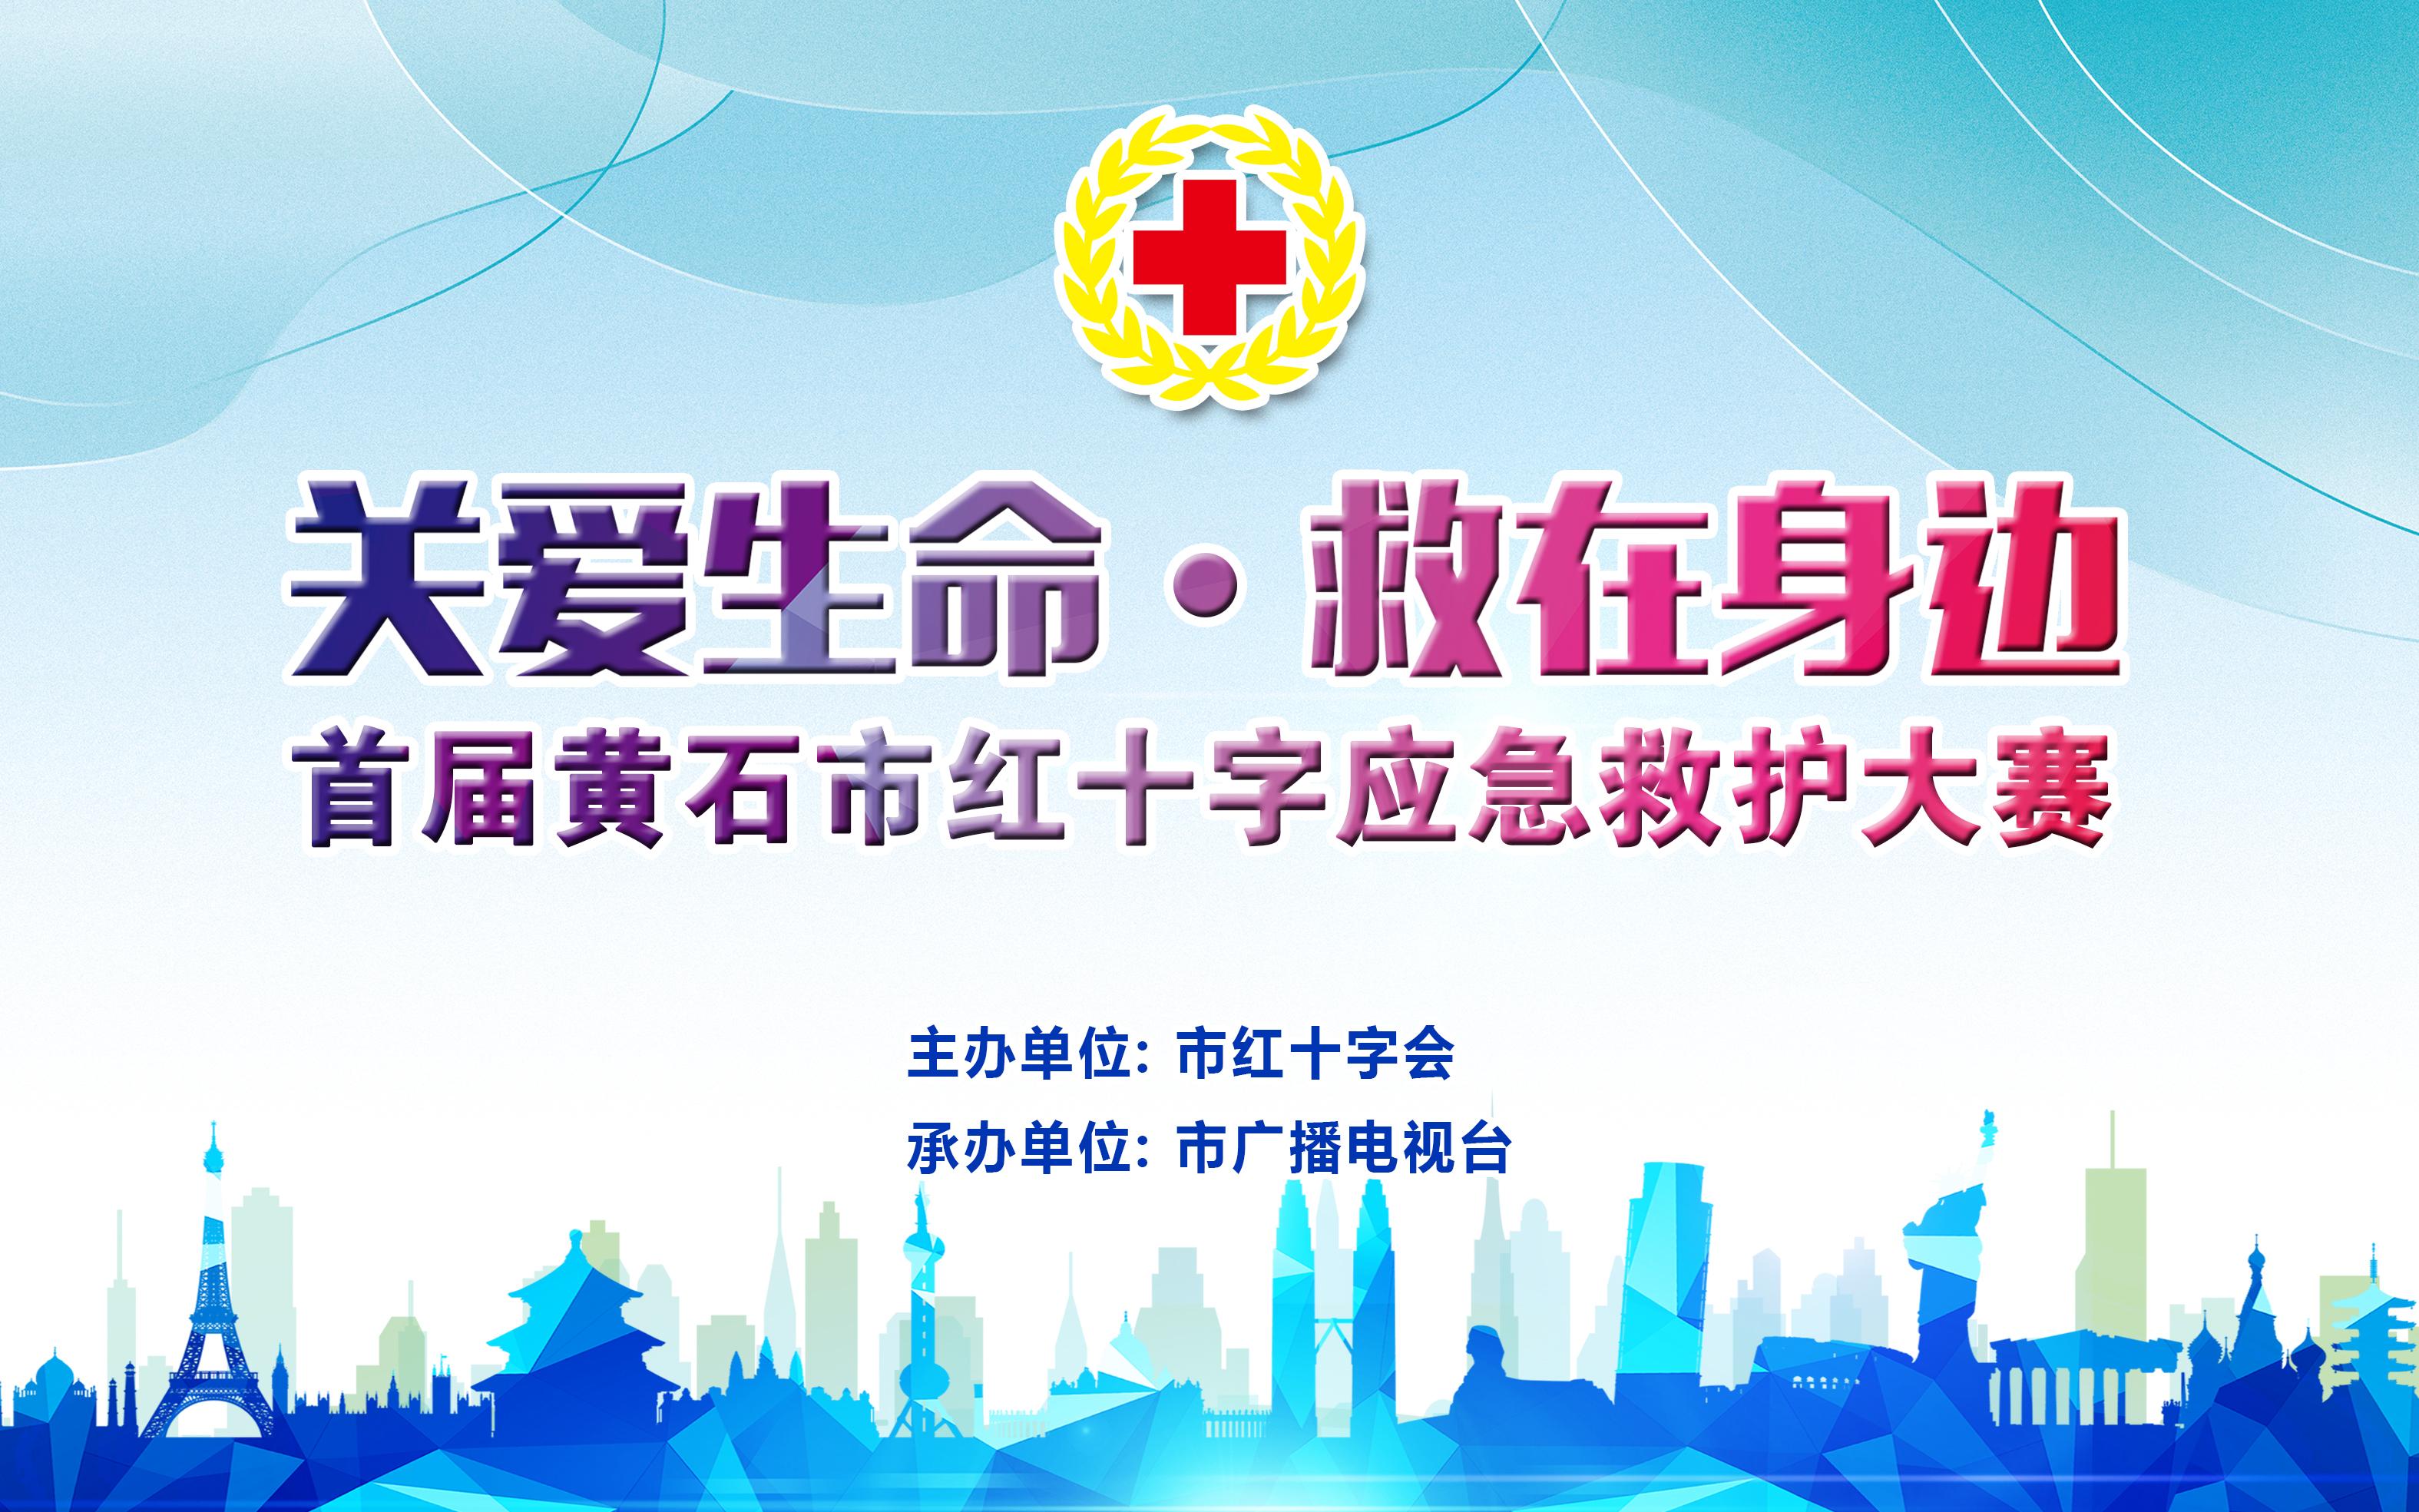 title='【直播】关爱生命 · 救在身边 首届黄石市红十字应急救护大赛'